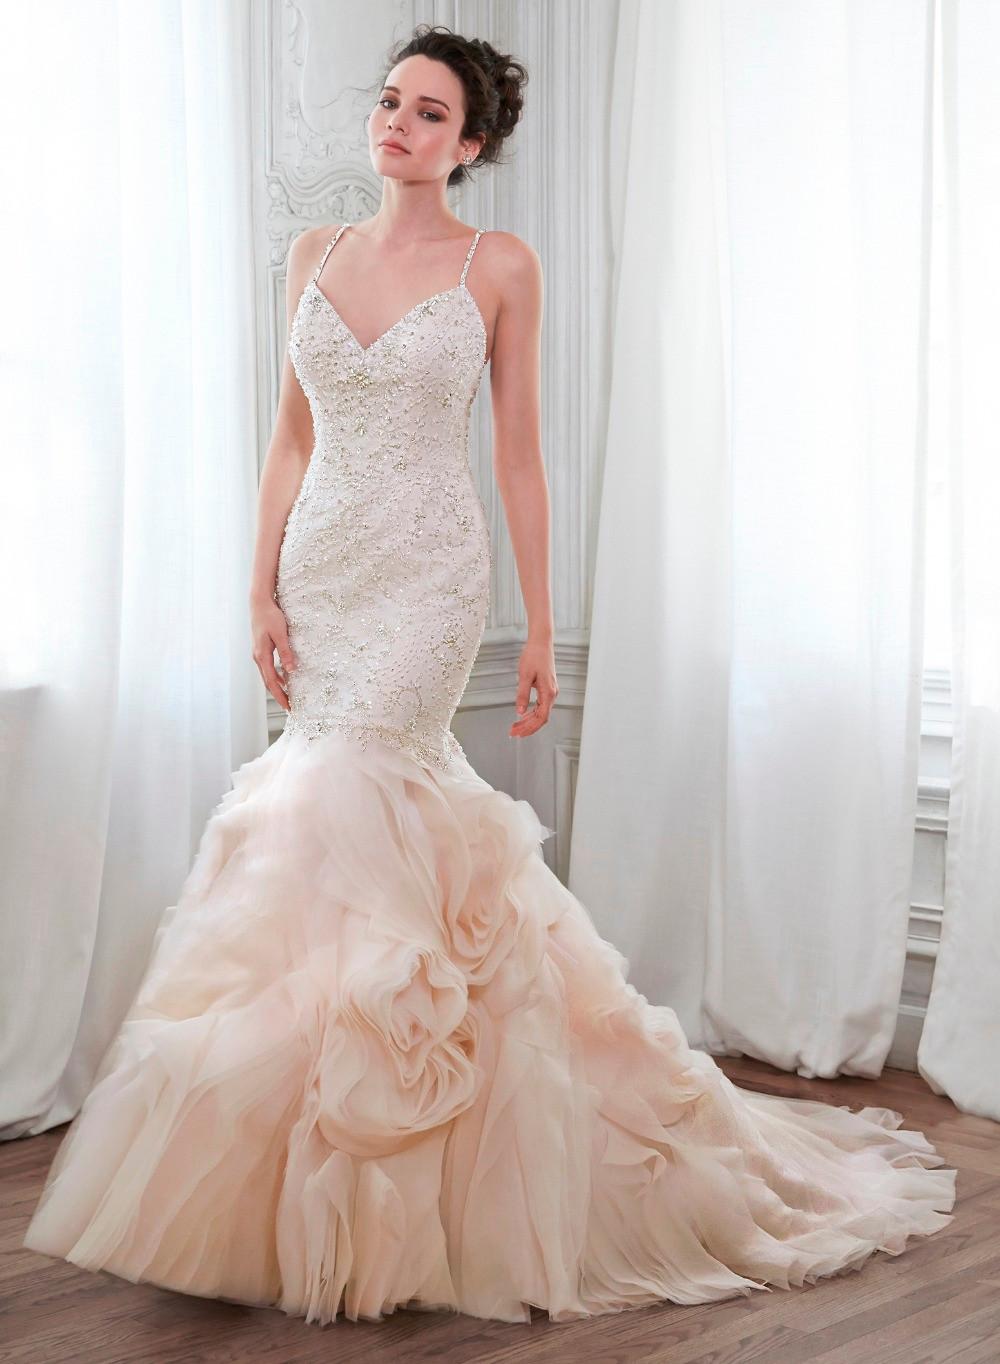 Spaghetti Strap Luxury Sequin Beaded Mermaid Wedding Dresses Tulle ...